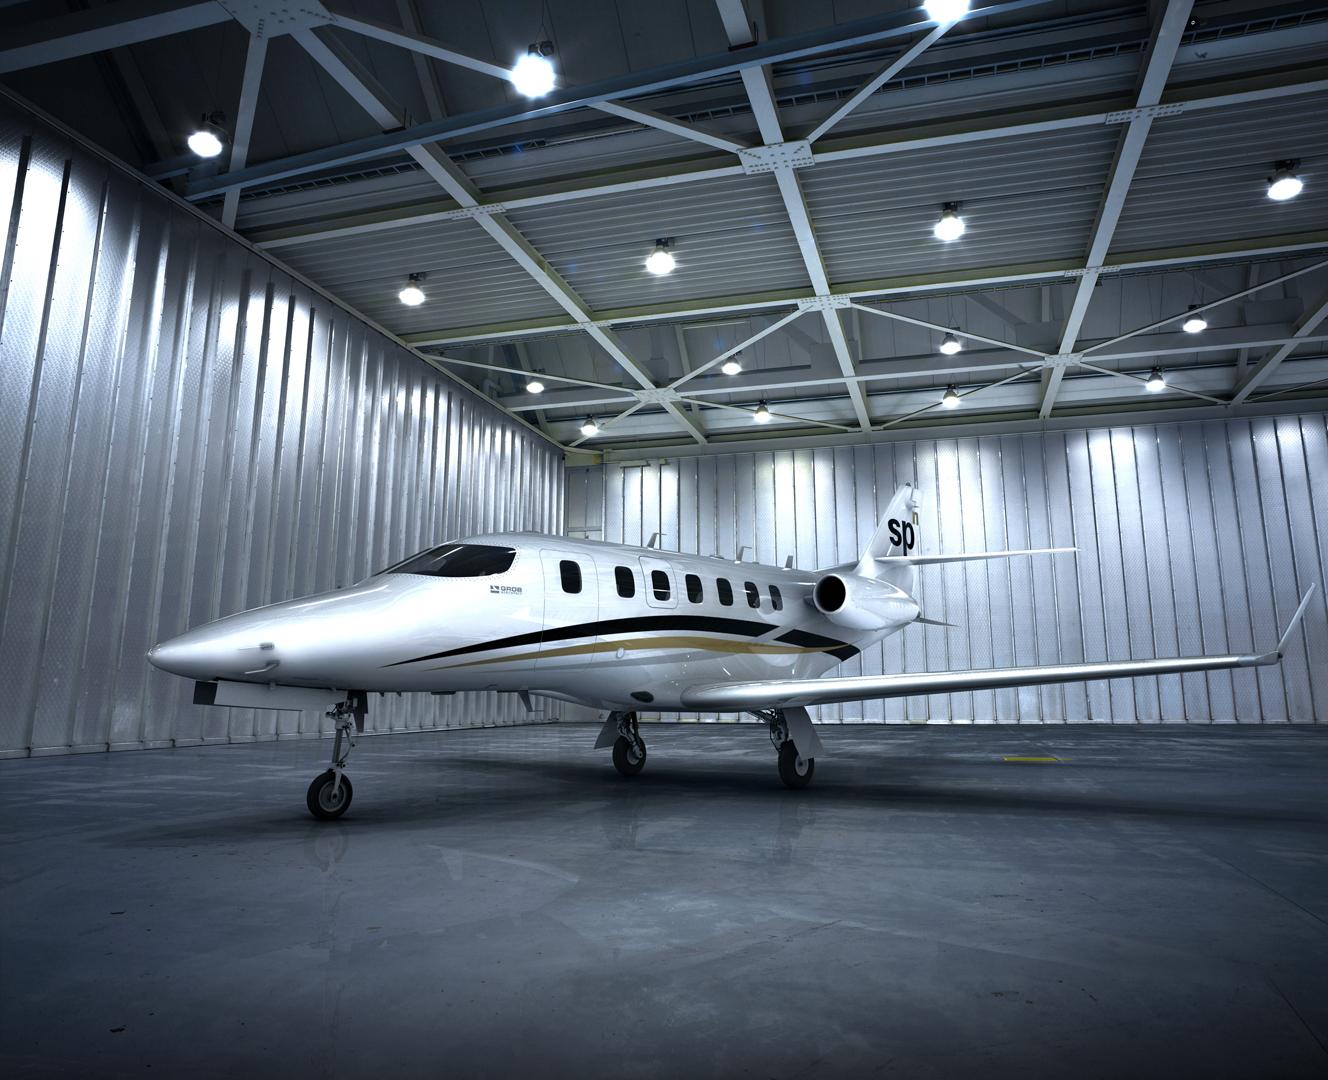 grob_spn_hangar_mittel